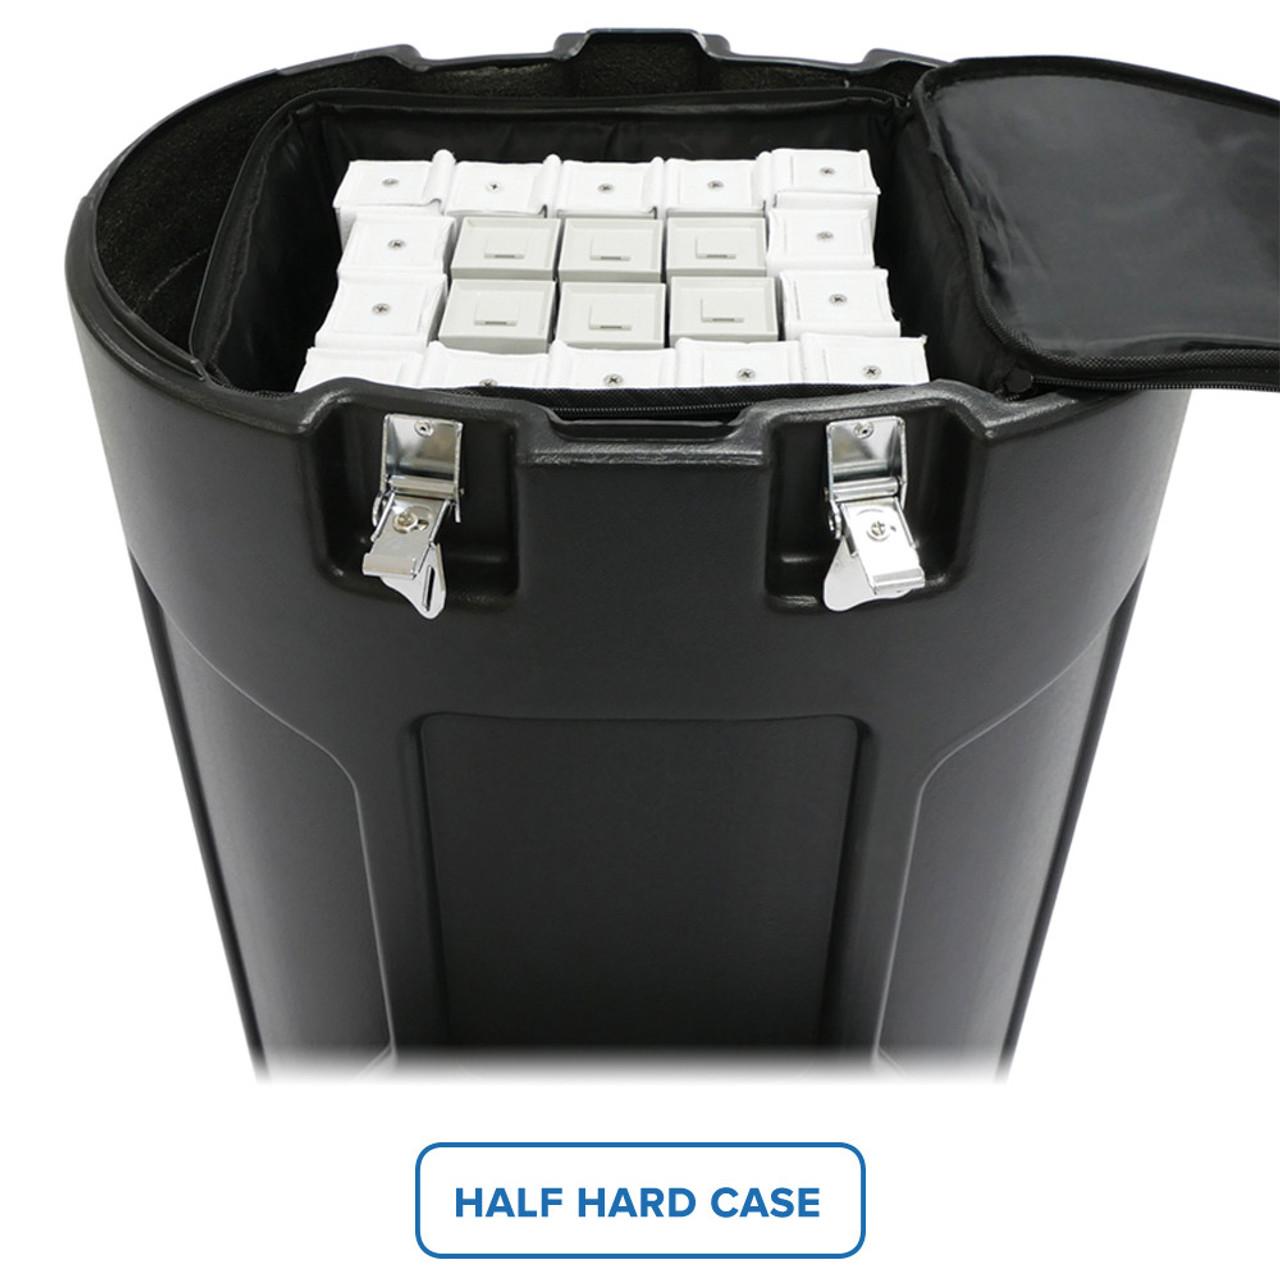 Inside view of Half Hard Case